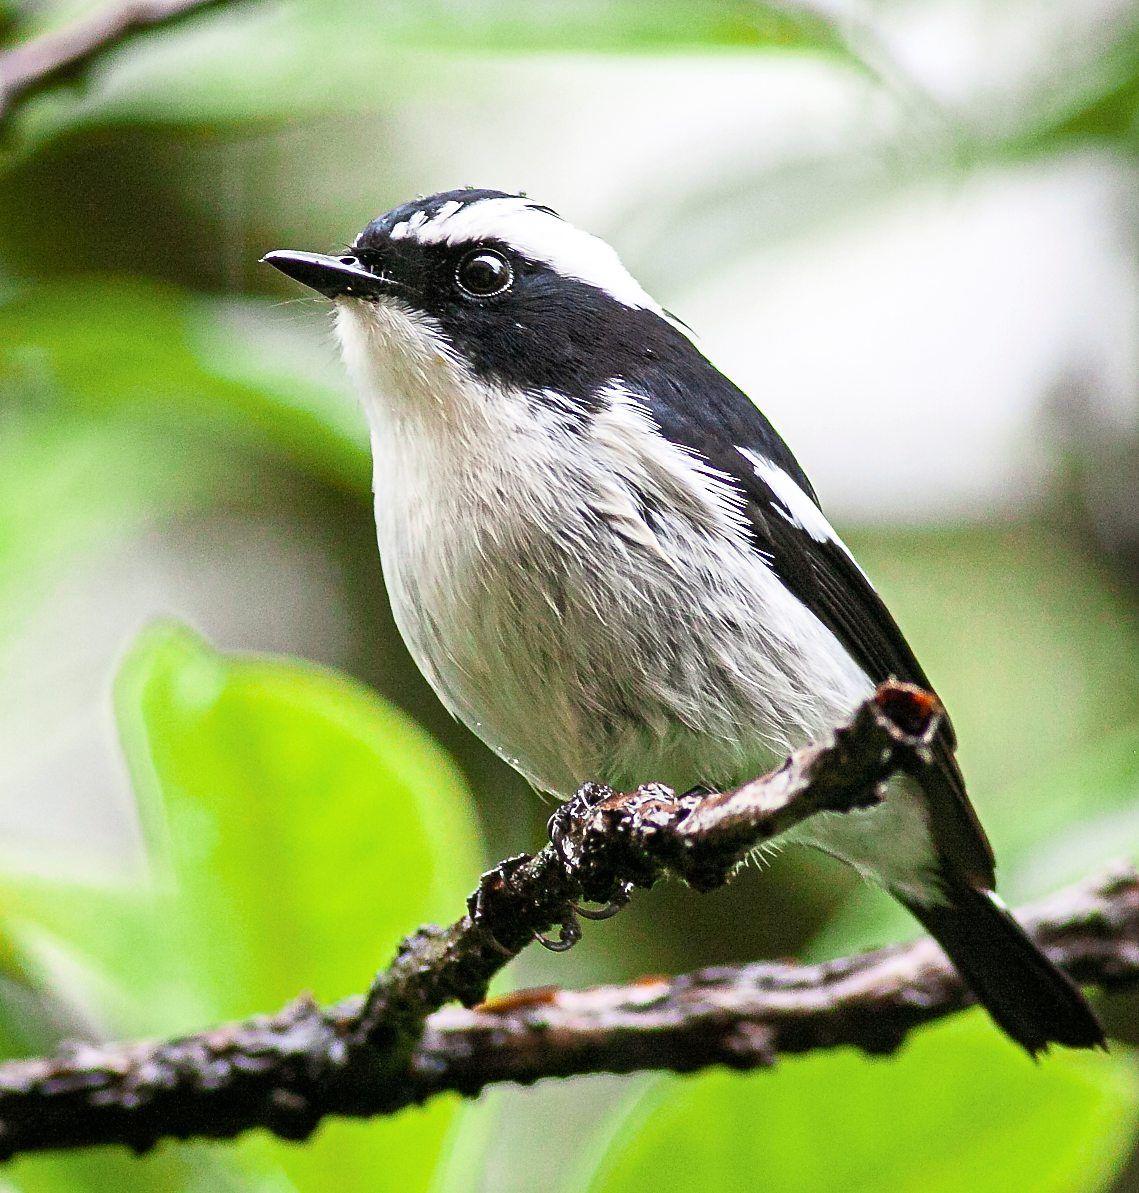 The striking black-and-white Little Pied Flycatcher that started Lim's birding journey. — WILBUR GOH